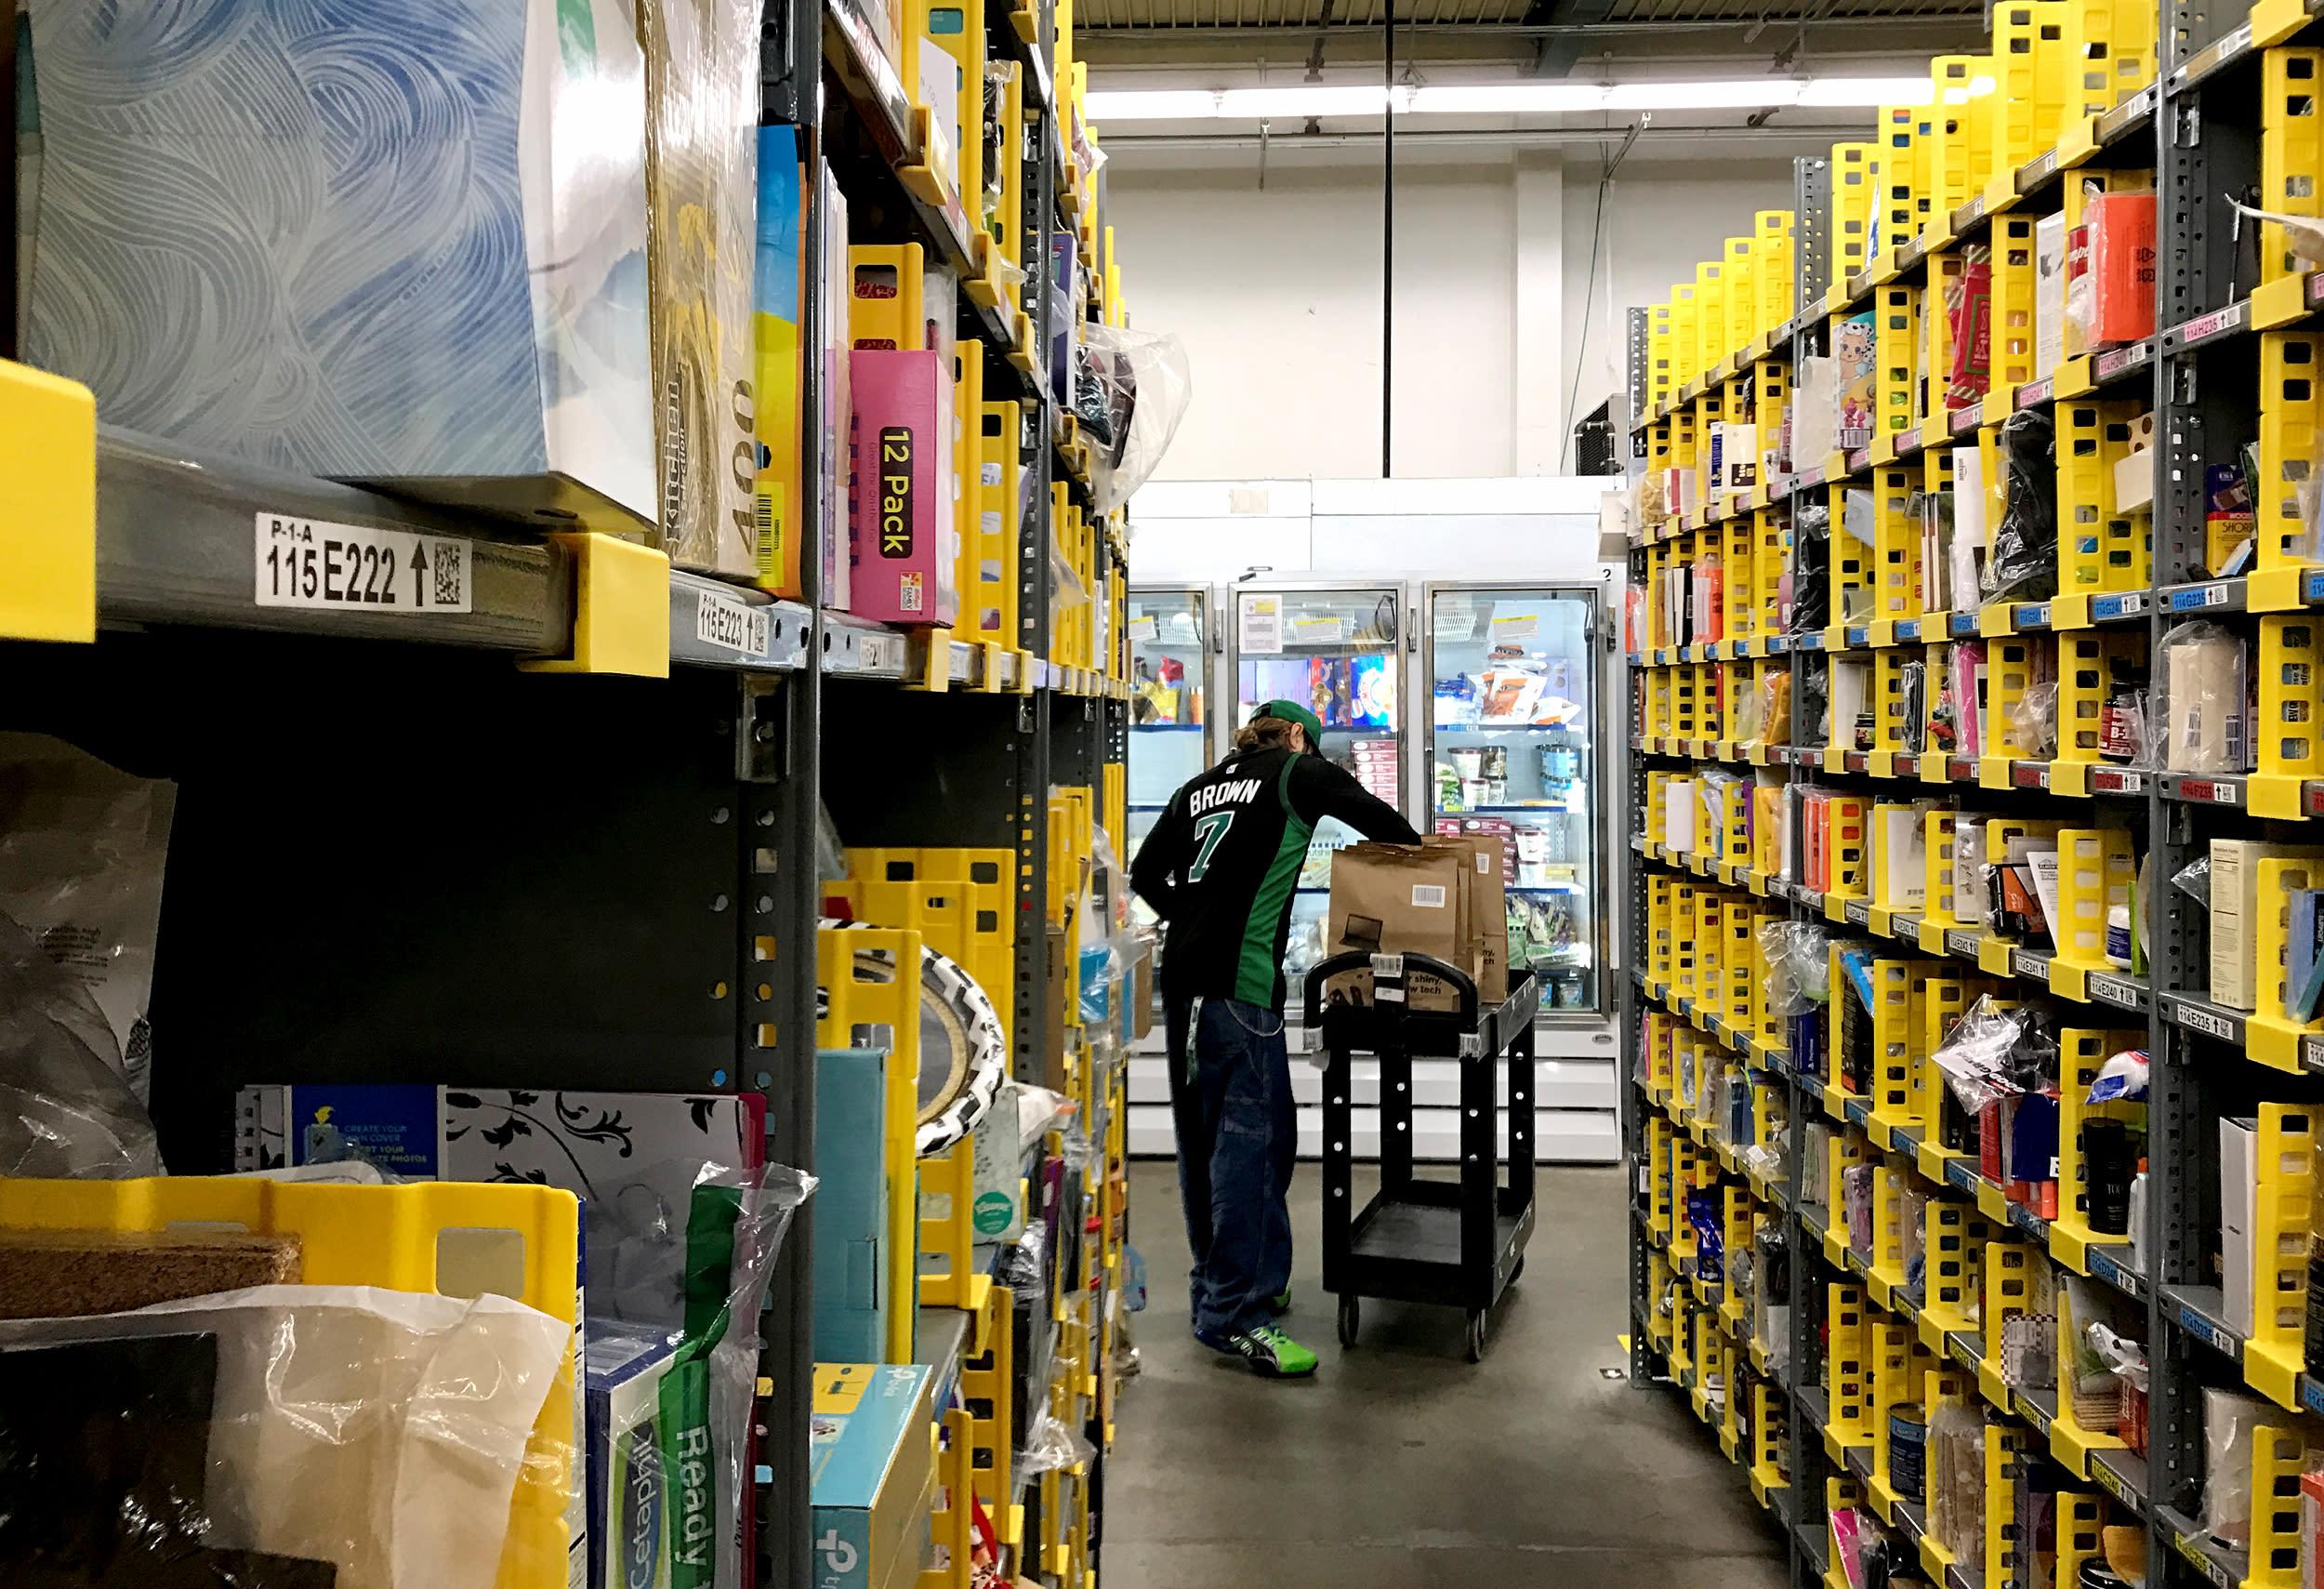 A bathroom-break bill? California looks to make sure warehouse workers can take a break